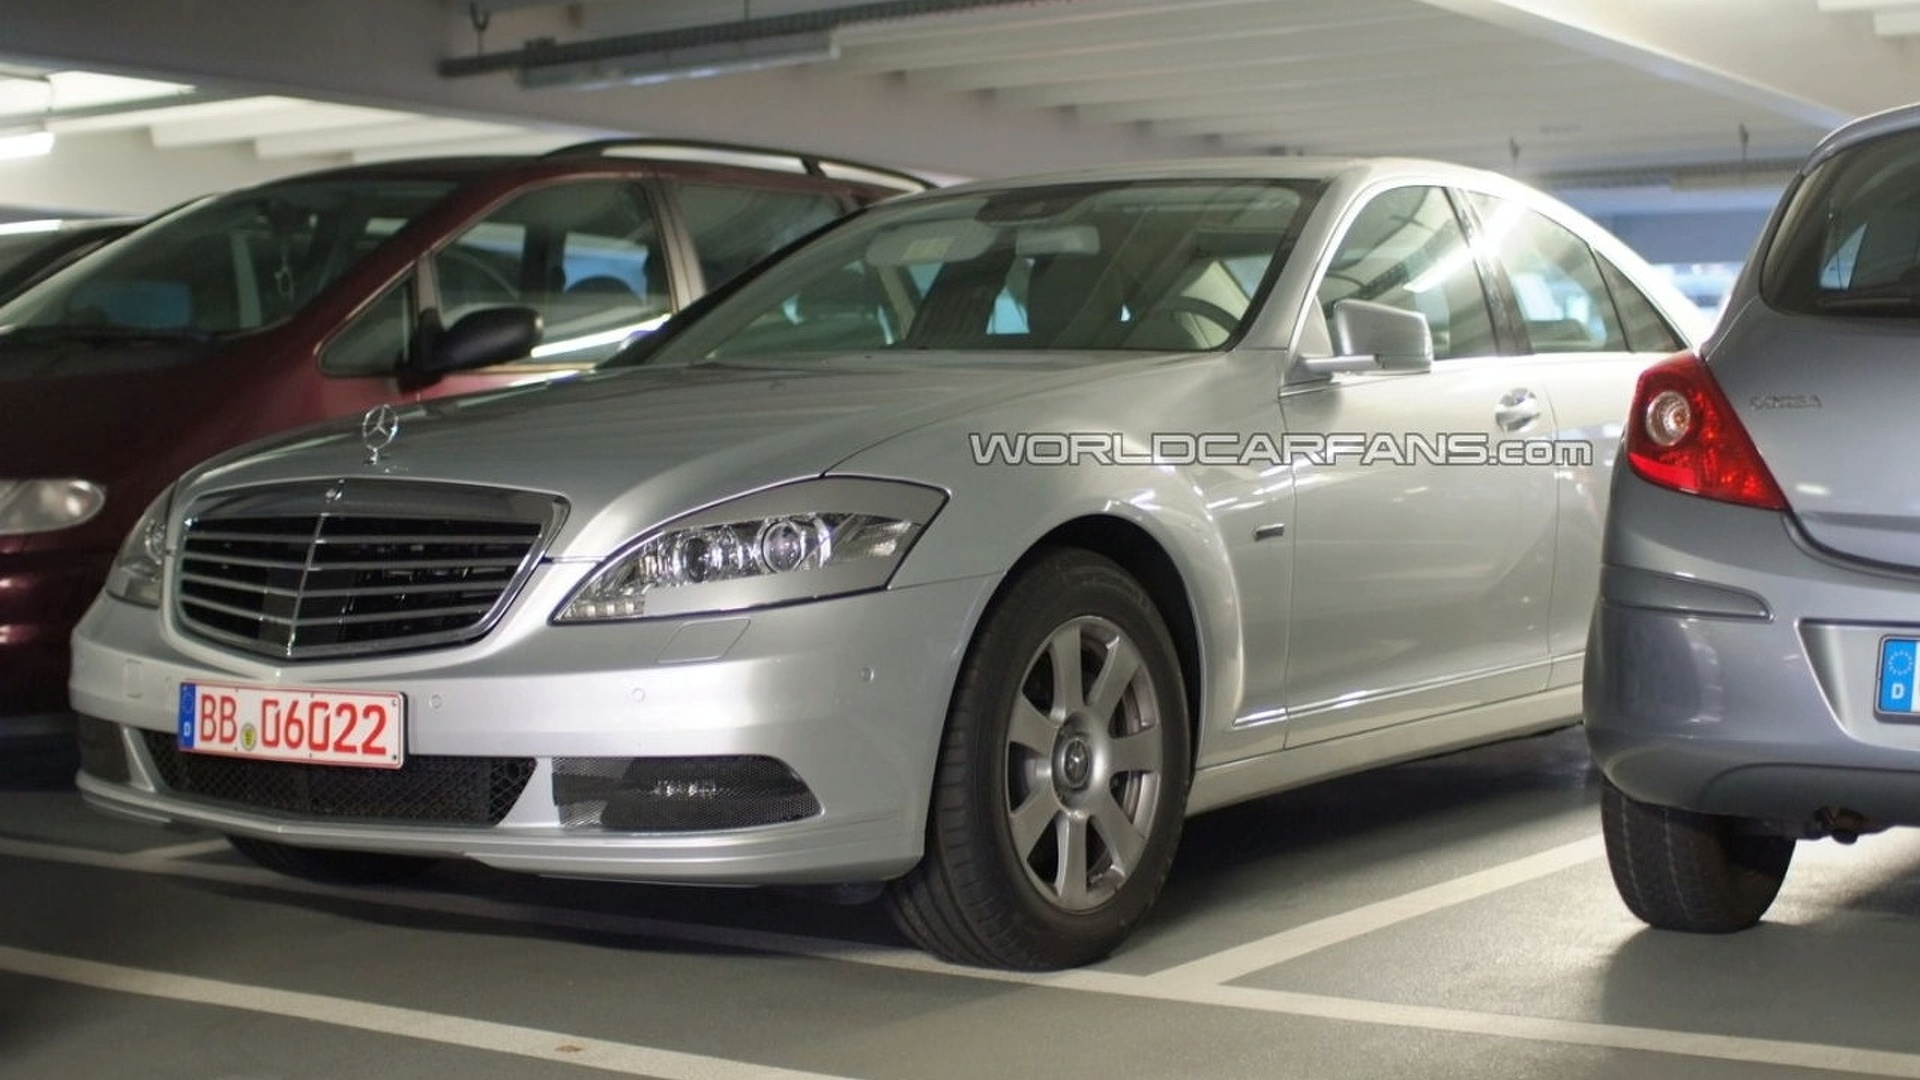 2010 mercedes benz s class facelift spied in parking garage. Black Bedroom Furniture Sets. Home Design Ideas